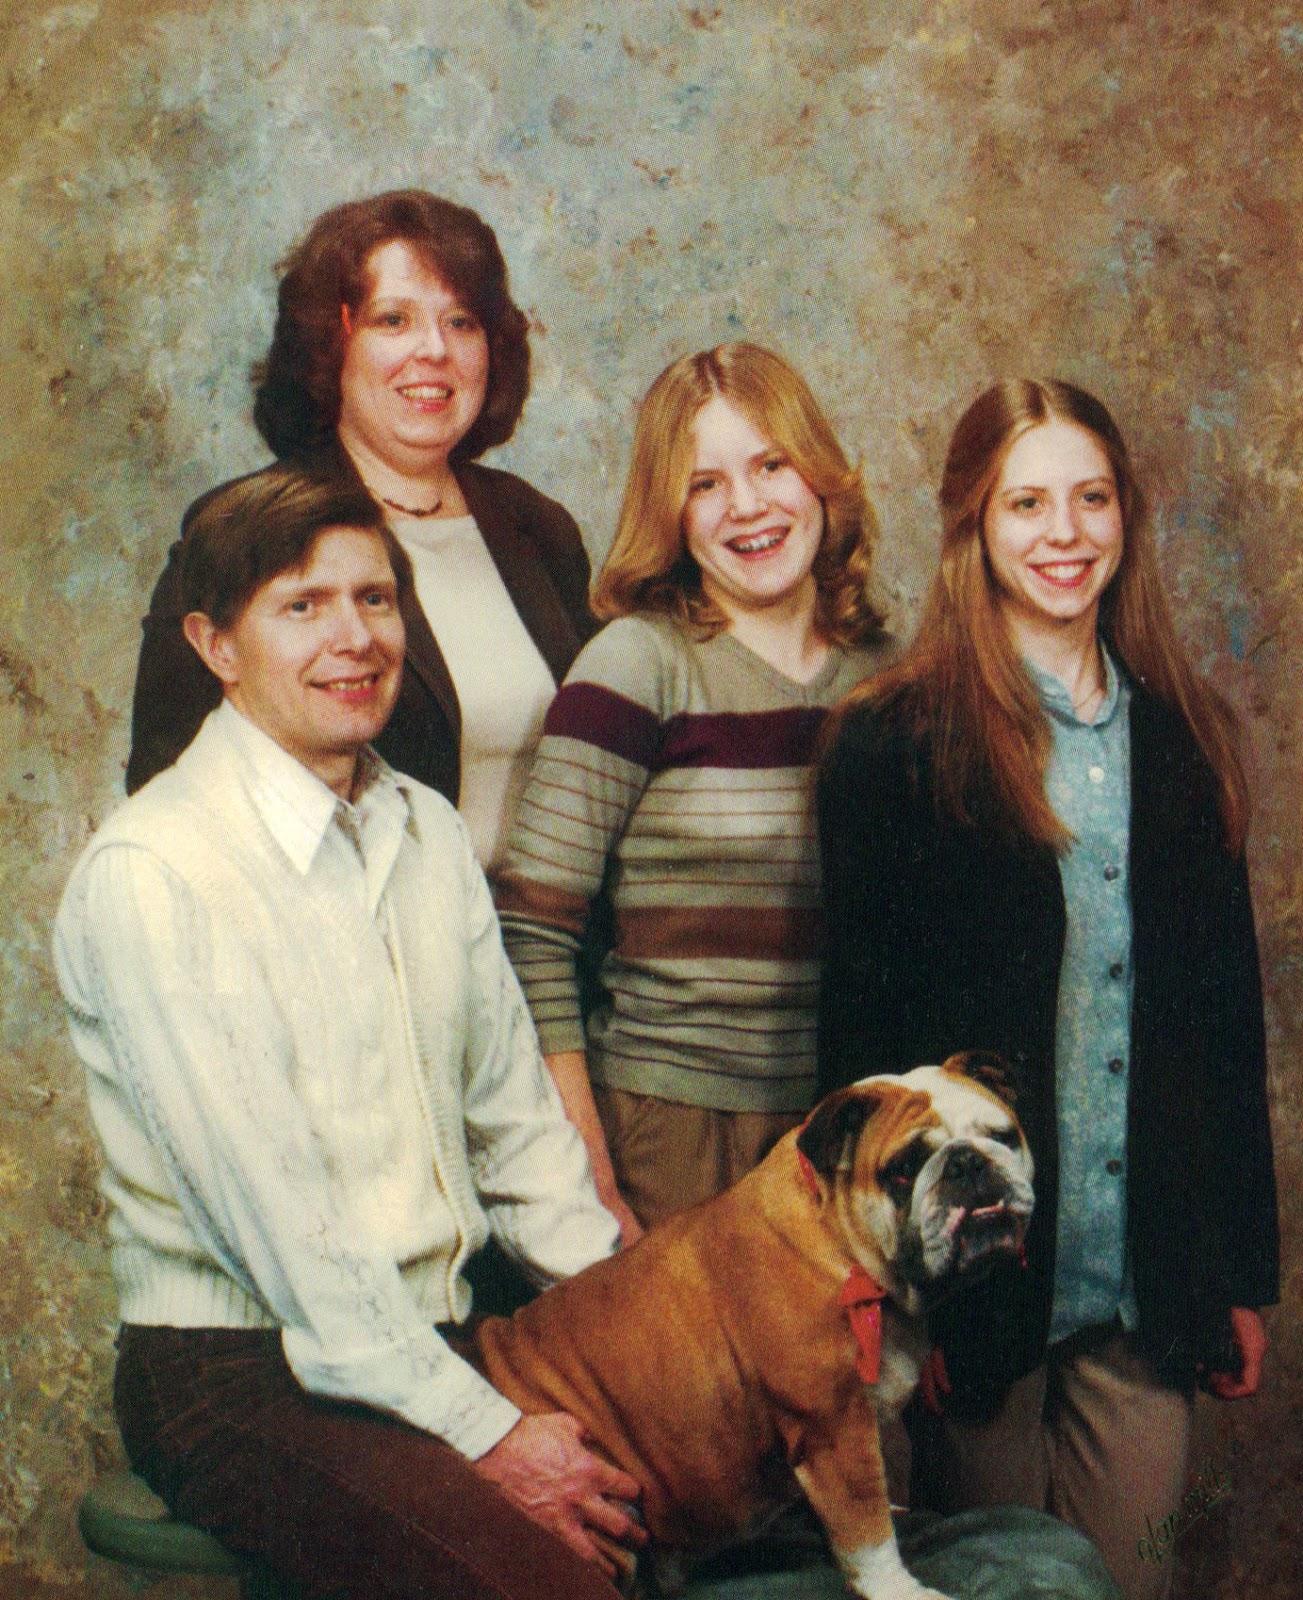 18 awkward family studio portraits of the 1980s